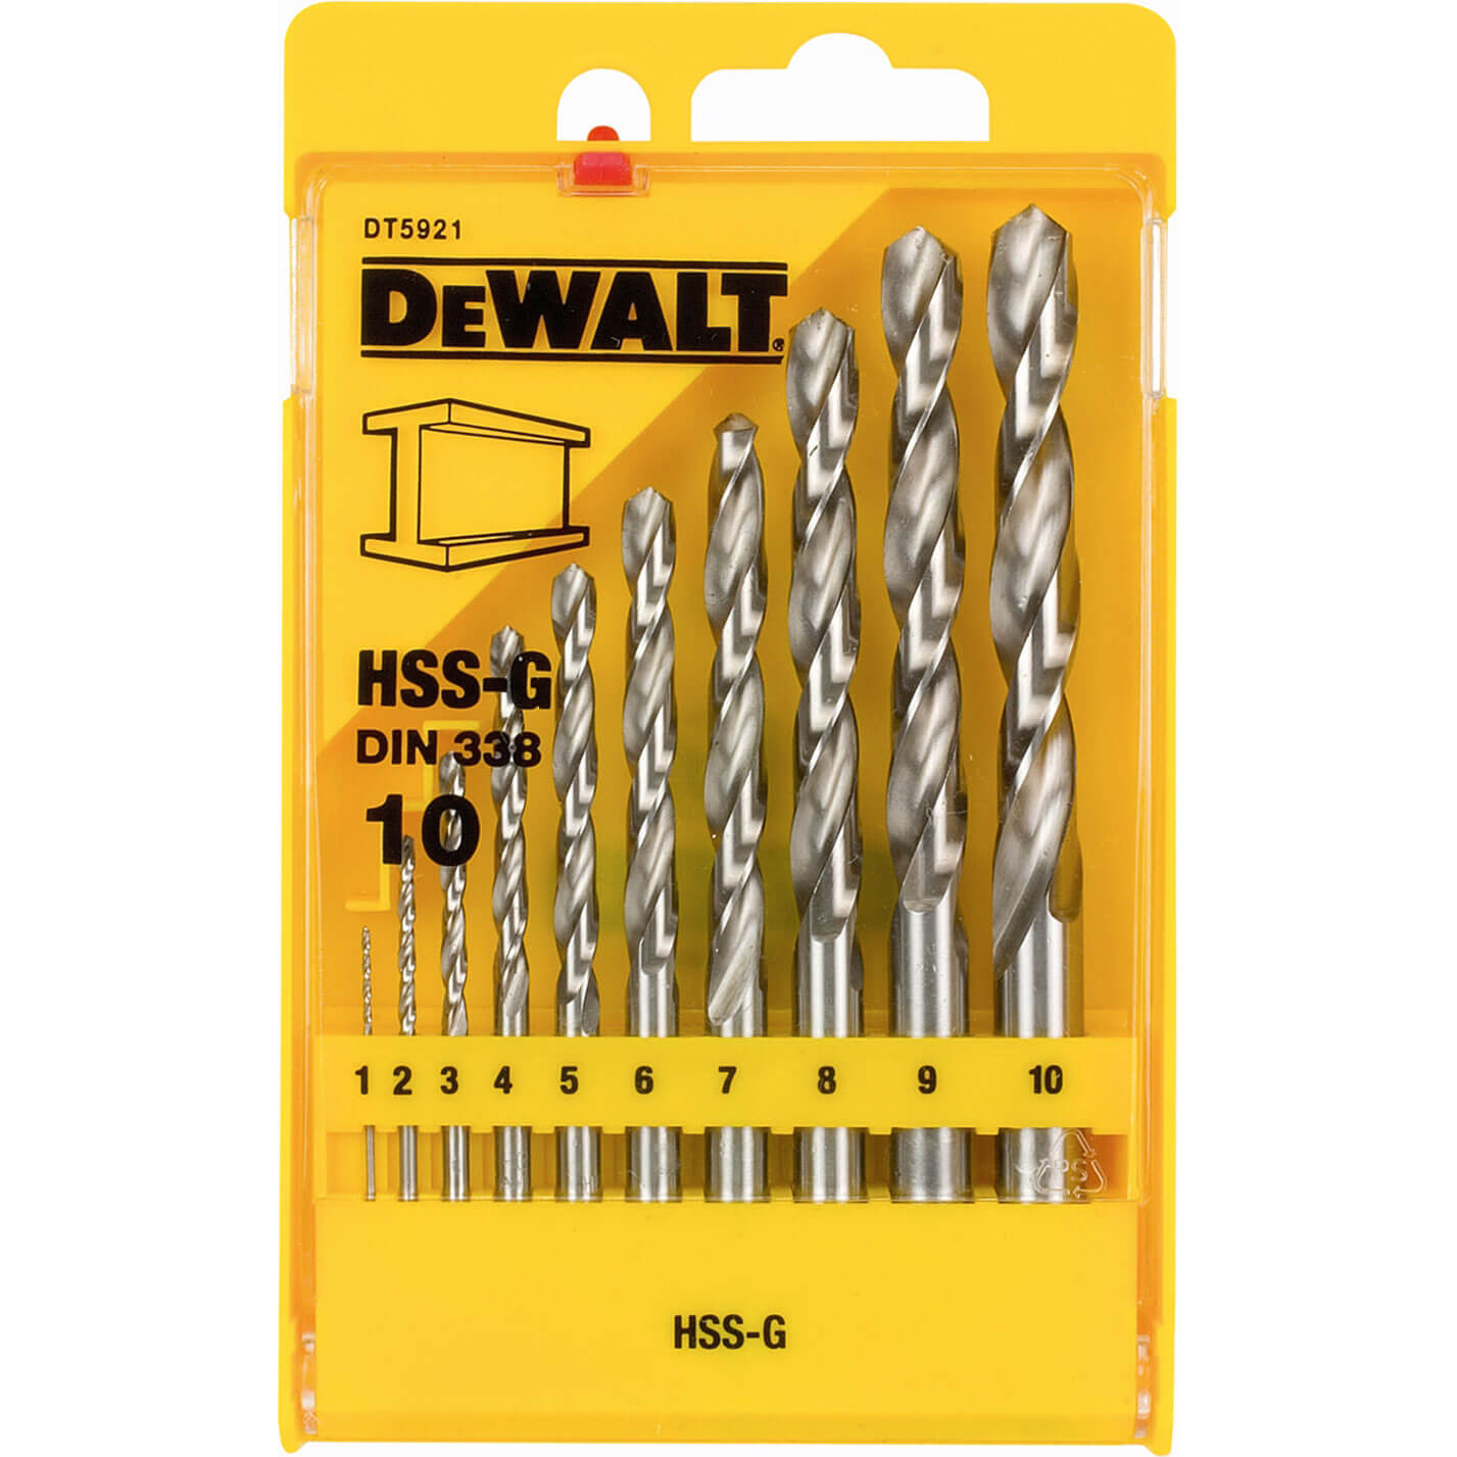 Image of DeWalt 10 Piece HSS-G Metal Drill Bit Set